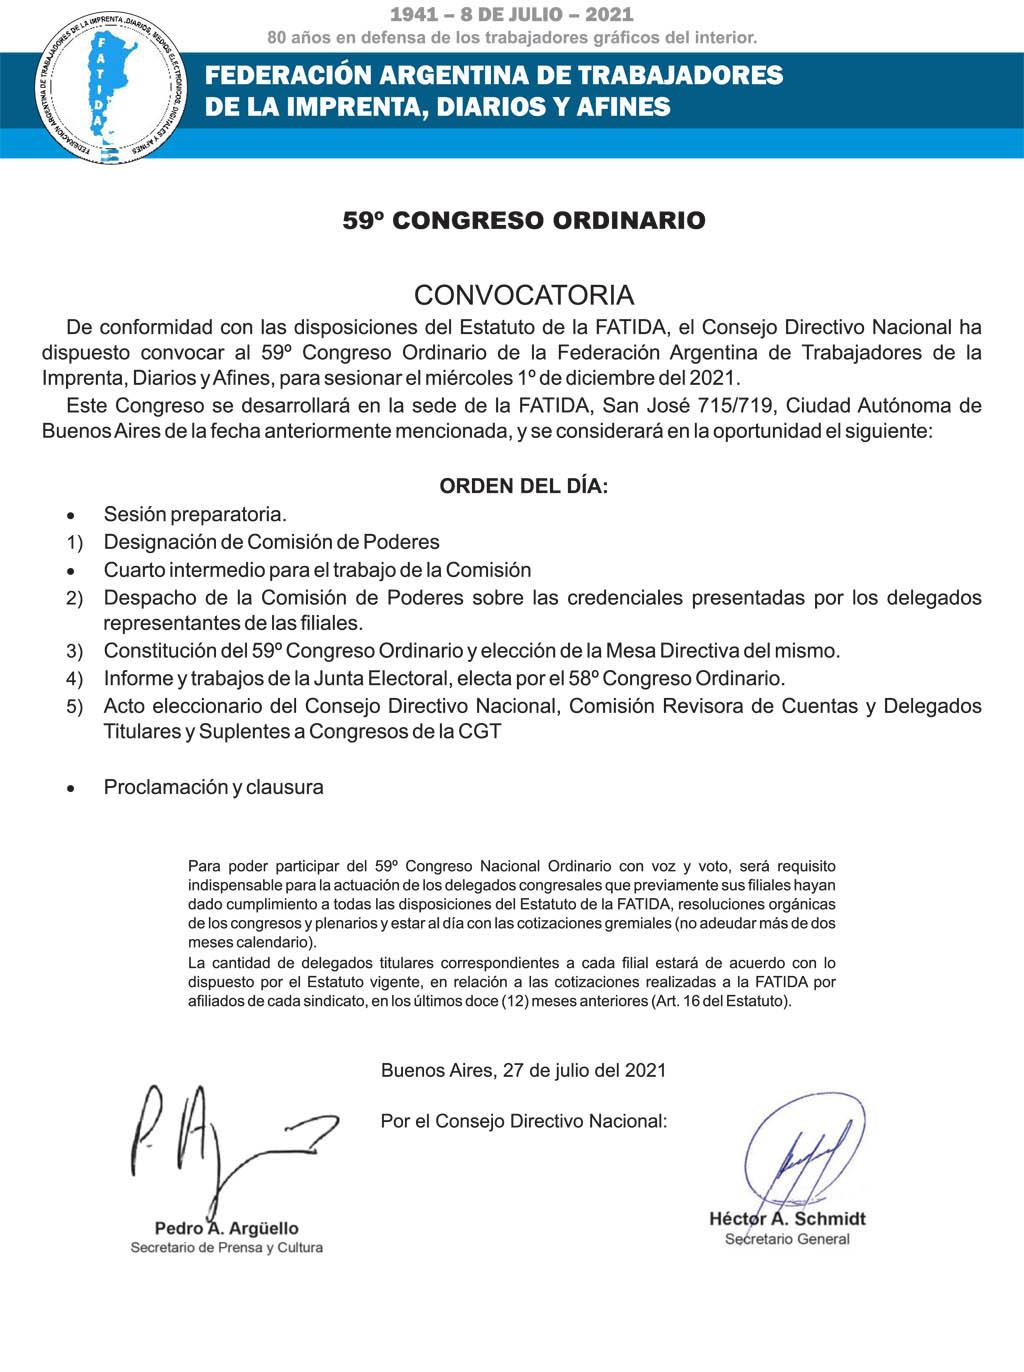 Convocatoria al 59° Congreso Ordinario